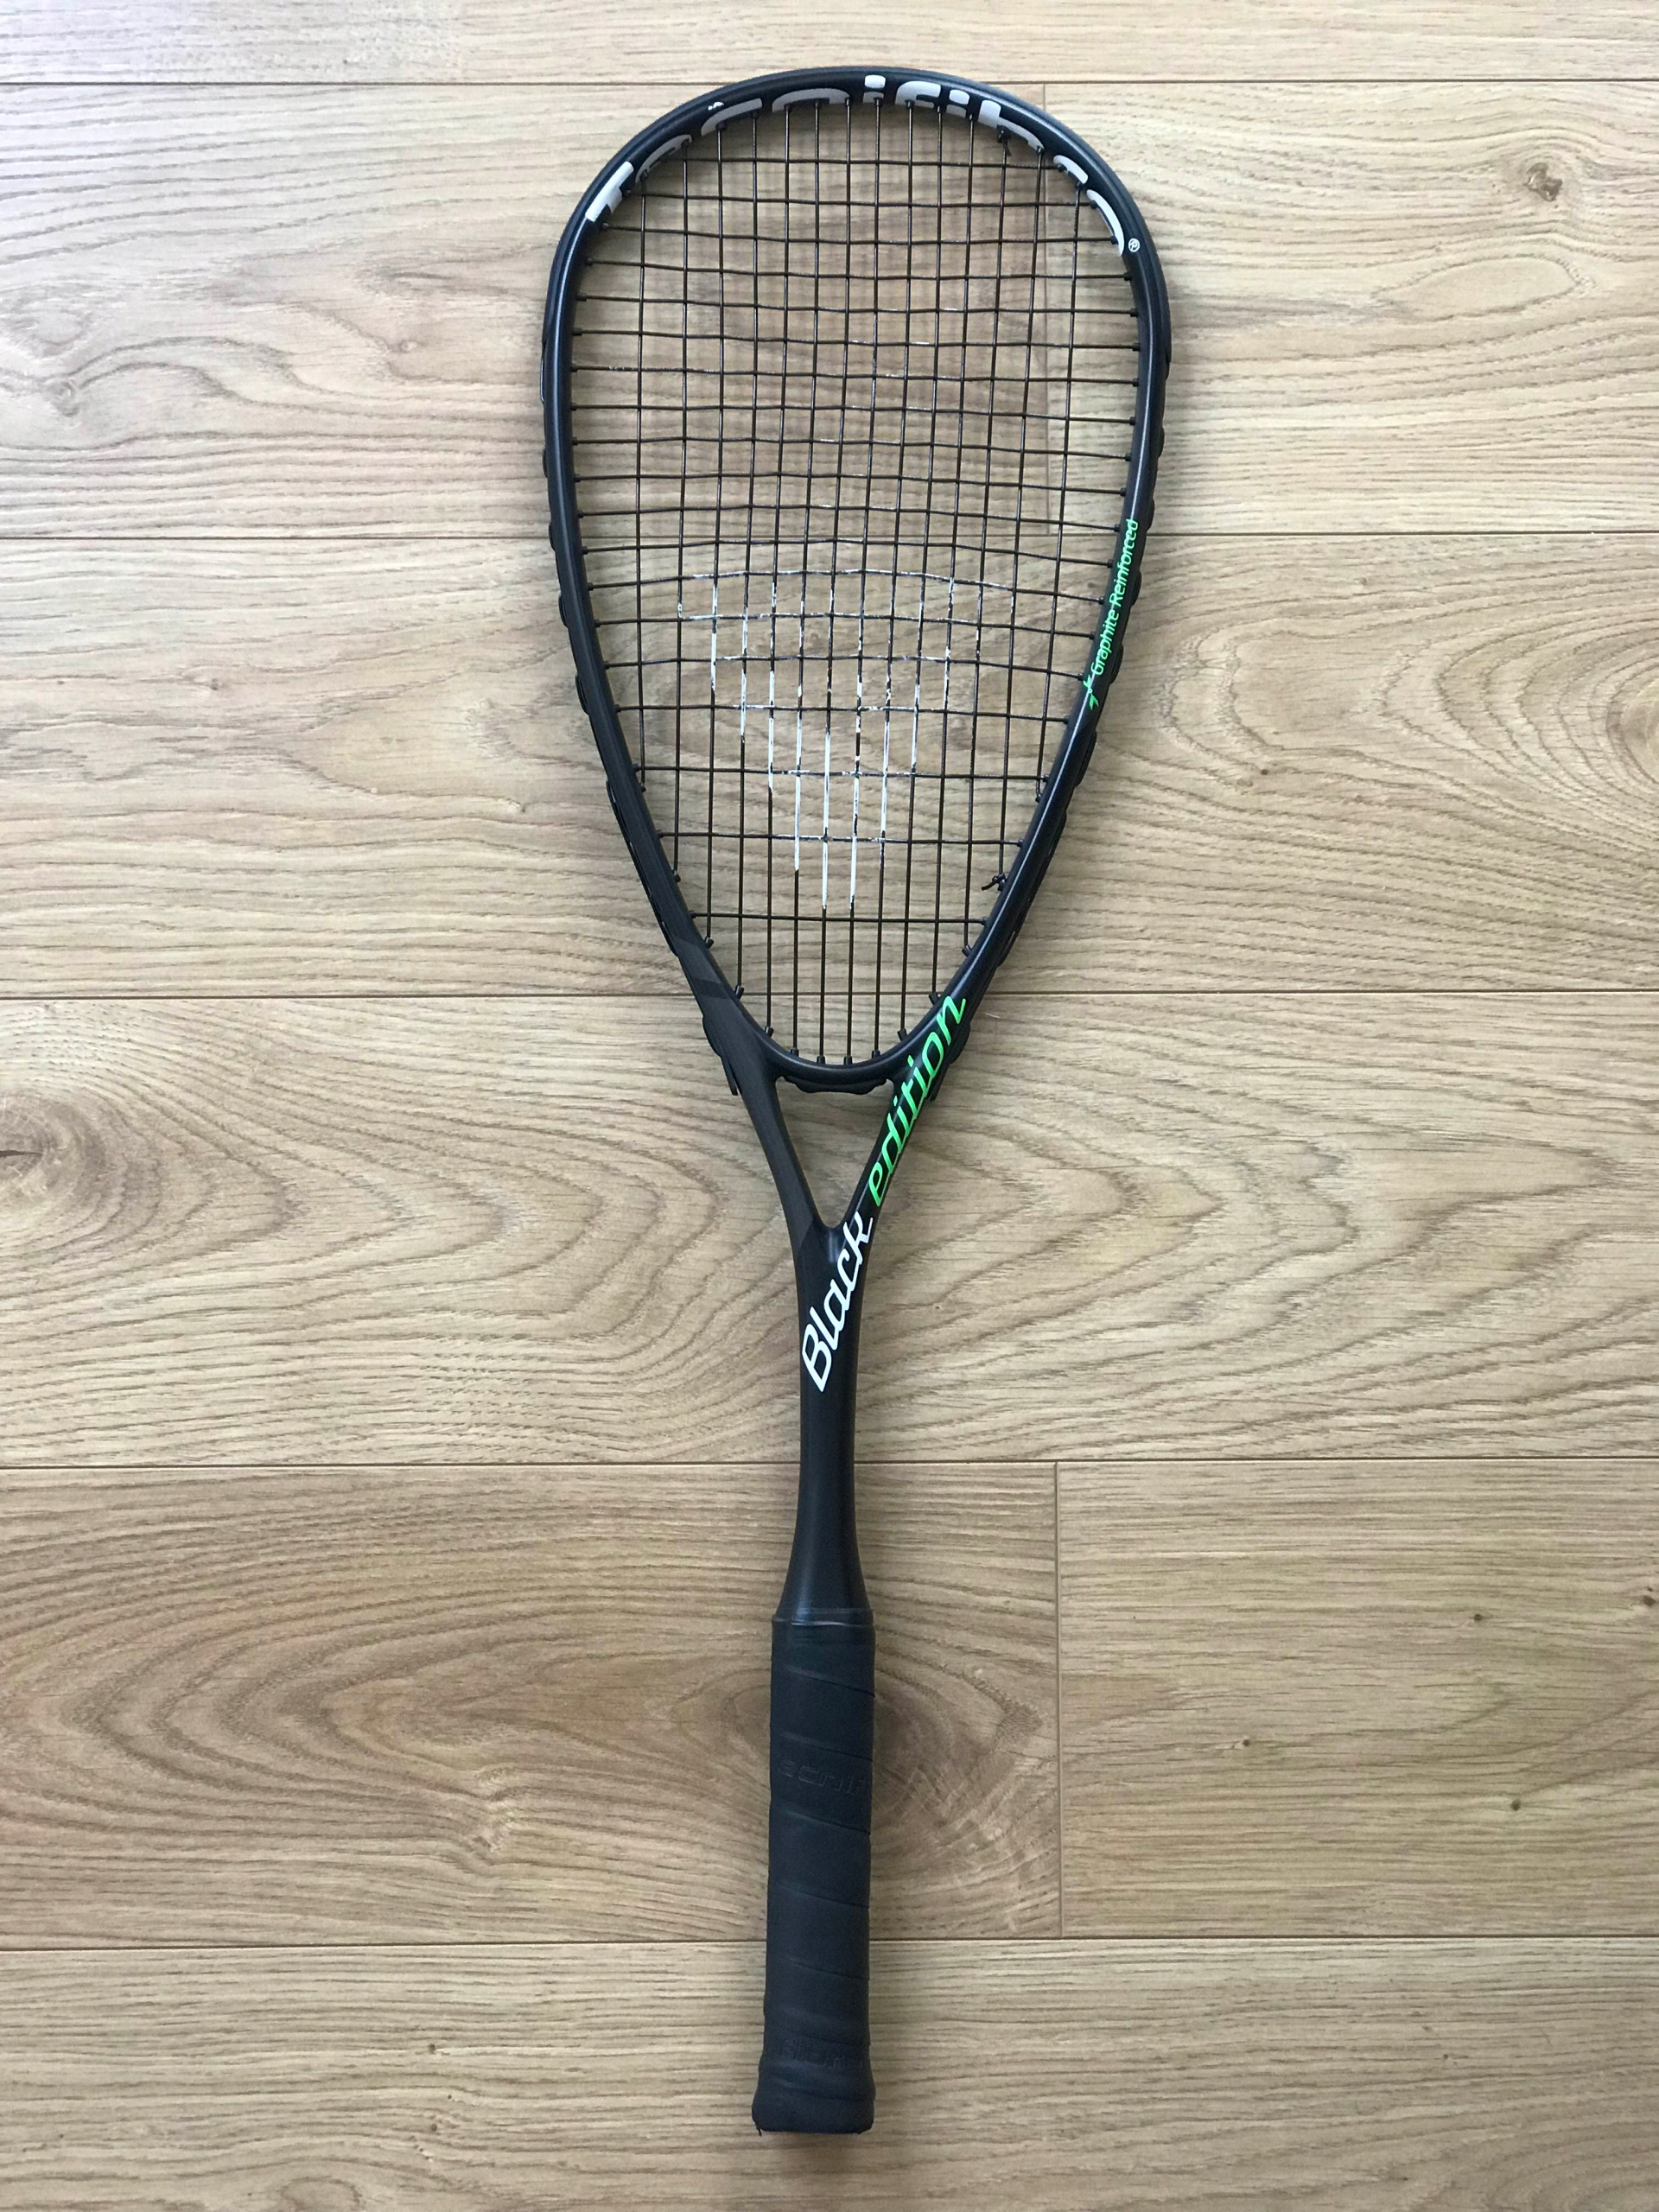 Rakieta do squasha Tecnifibre Black Edition 2017